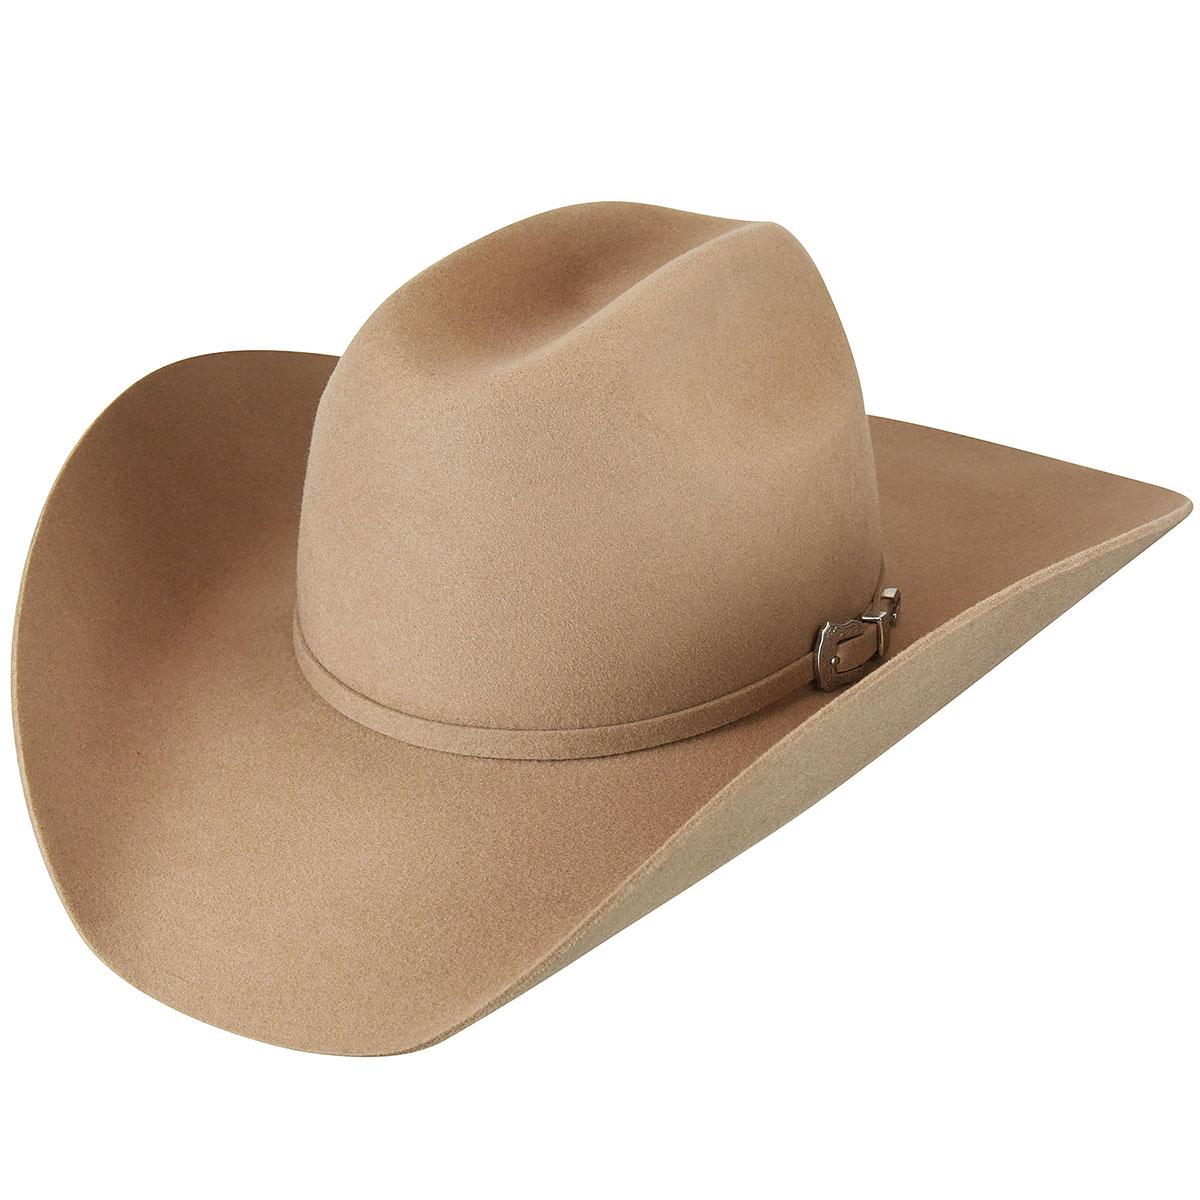 1940s Mens Hats | Fedora, Homburg, Pork Pie Hats Trigger 2X Hat $96.00 AT vintagedancer.com